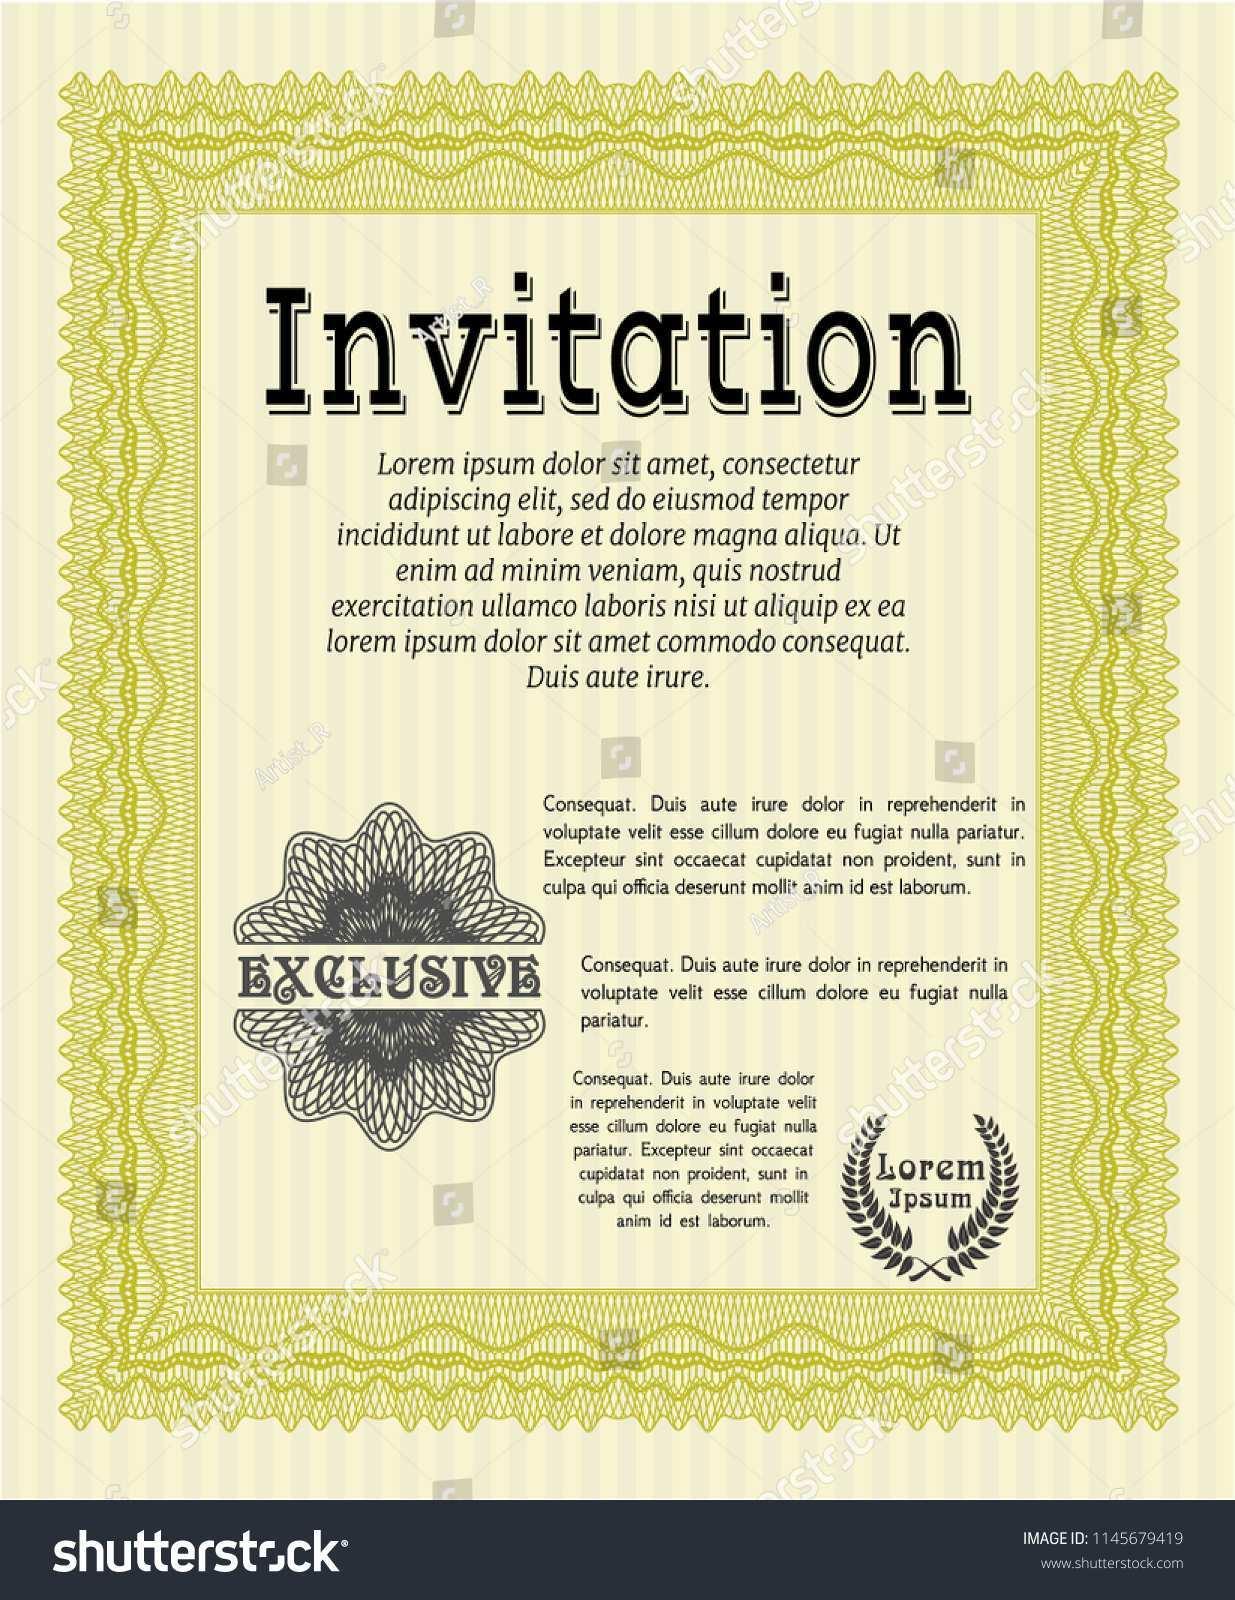 26 Online Formal Invitation Template Vector in Word with Formal Invitation Template Vector